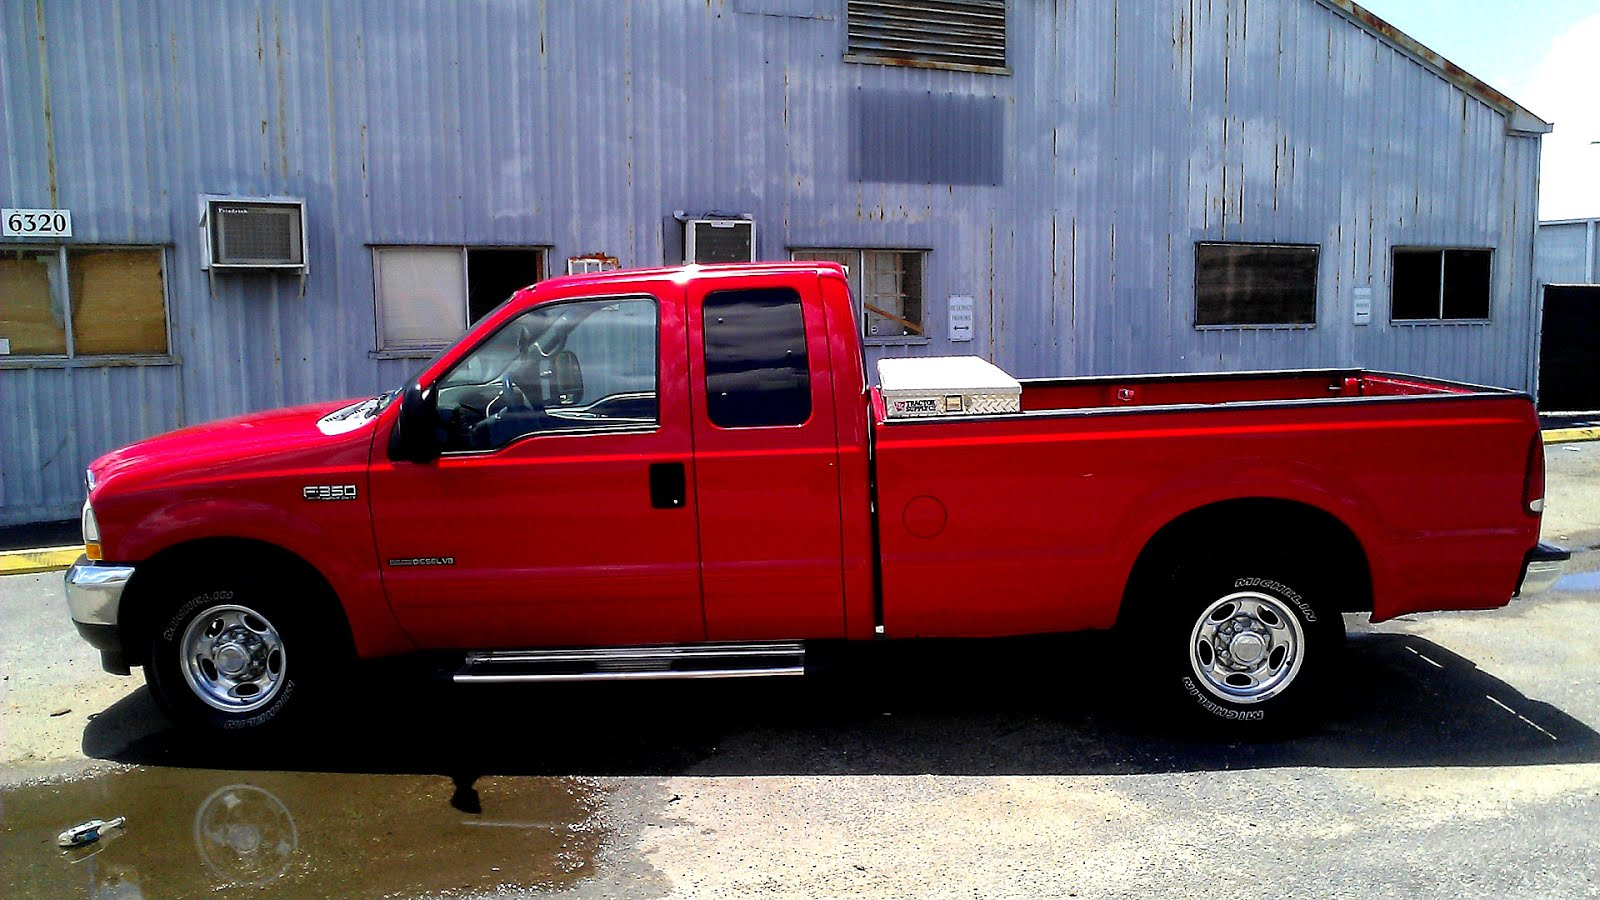 Craigslist Cars And Trucks Springfield Mo - Truck Choices